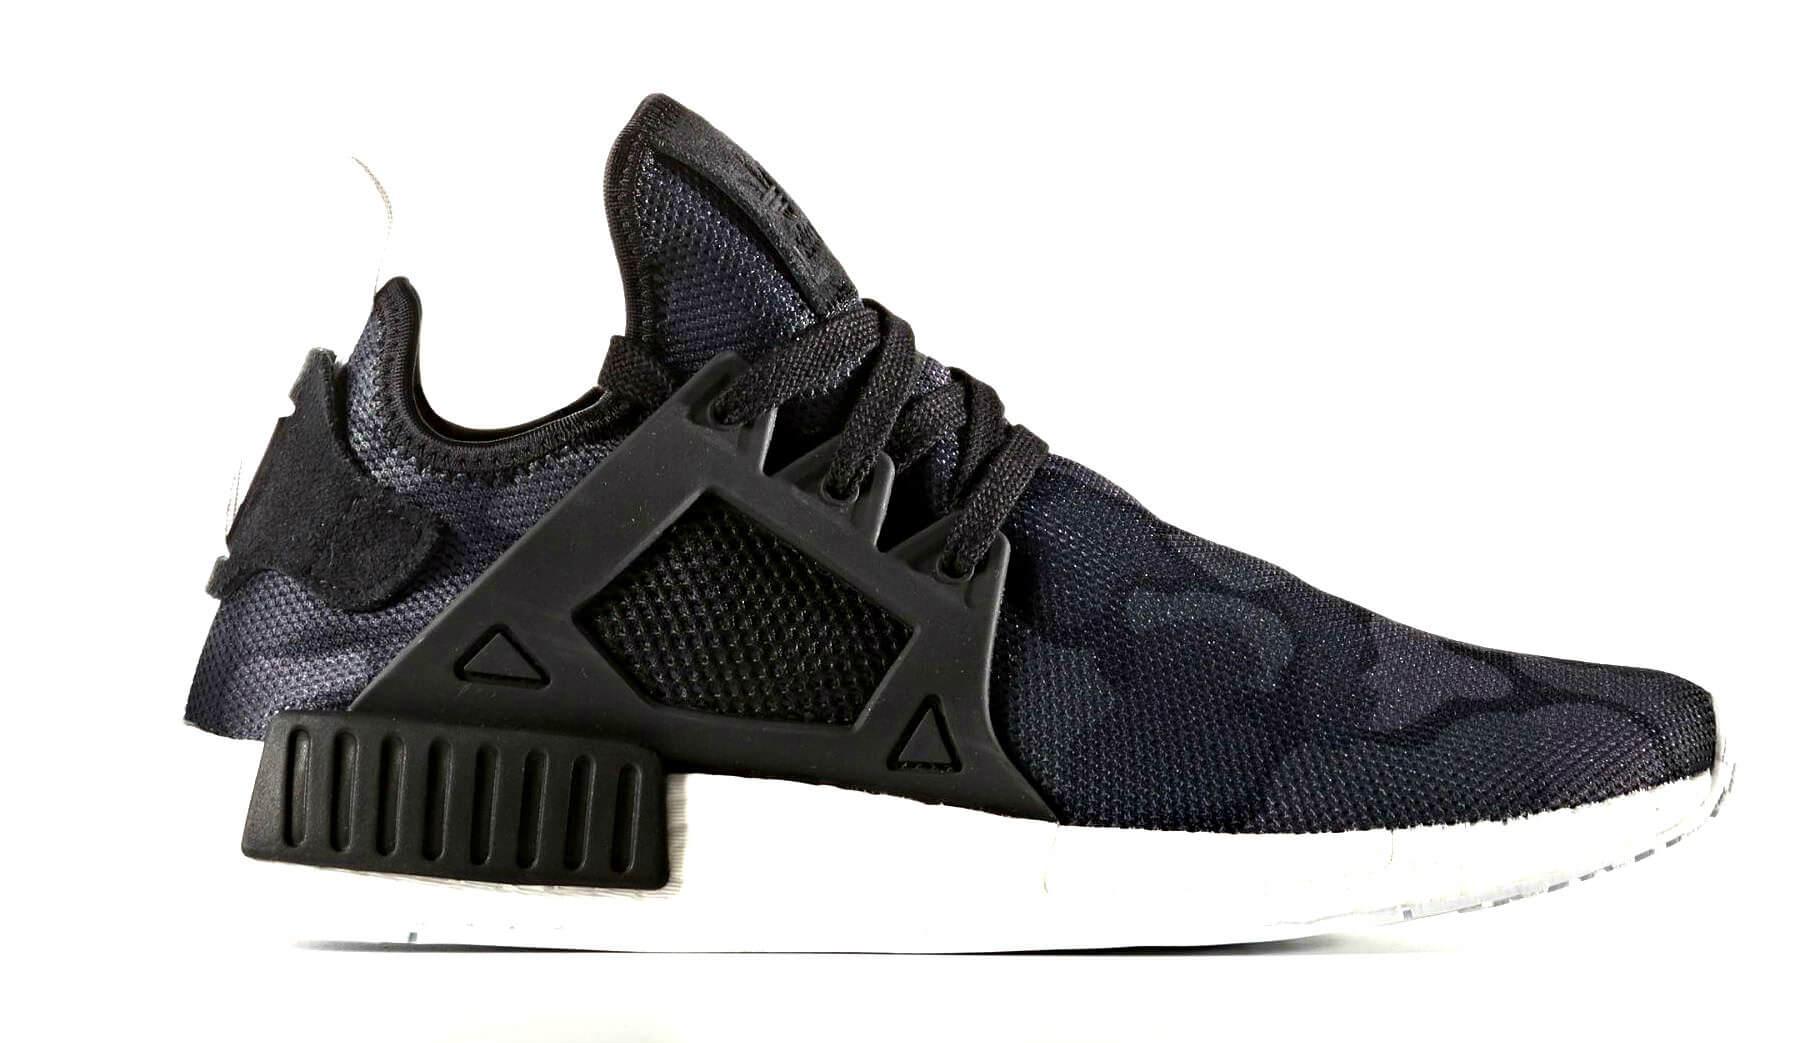 Adidas Iniki Runner Boost (Core BlackWhite) YouTube